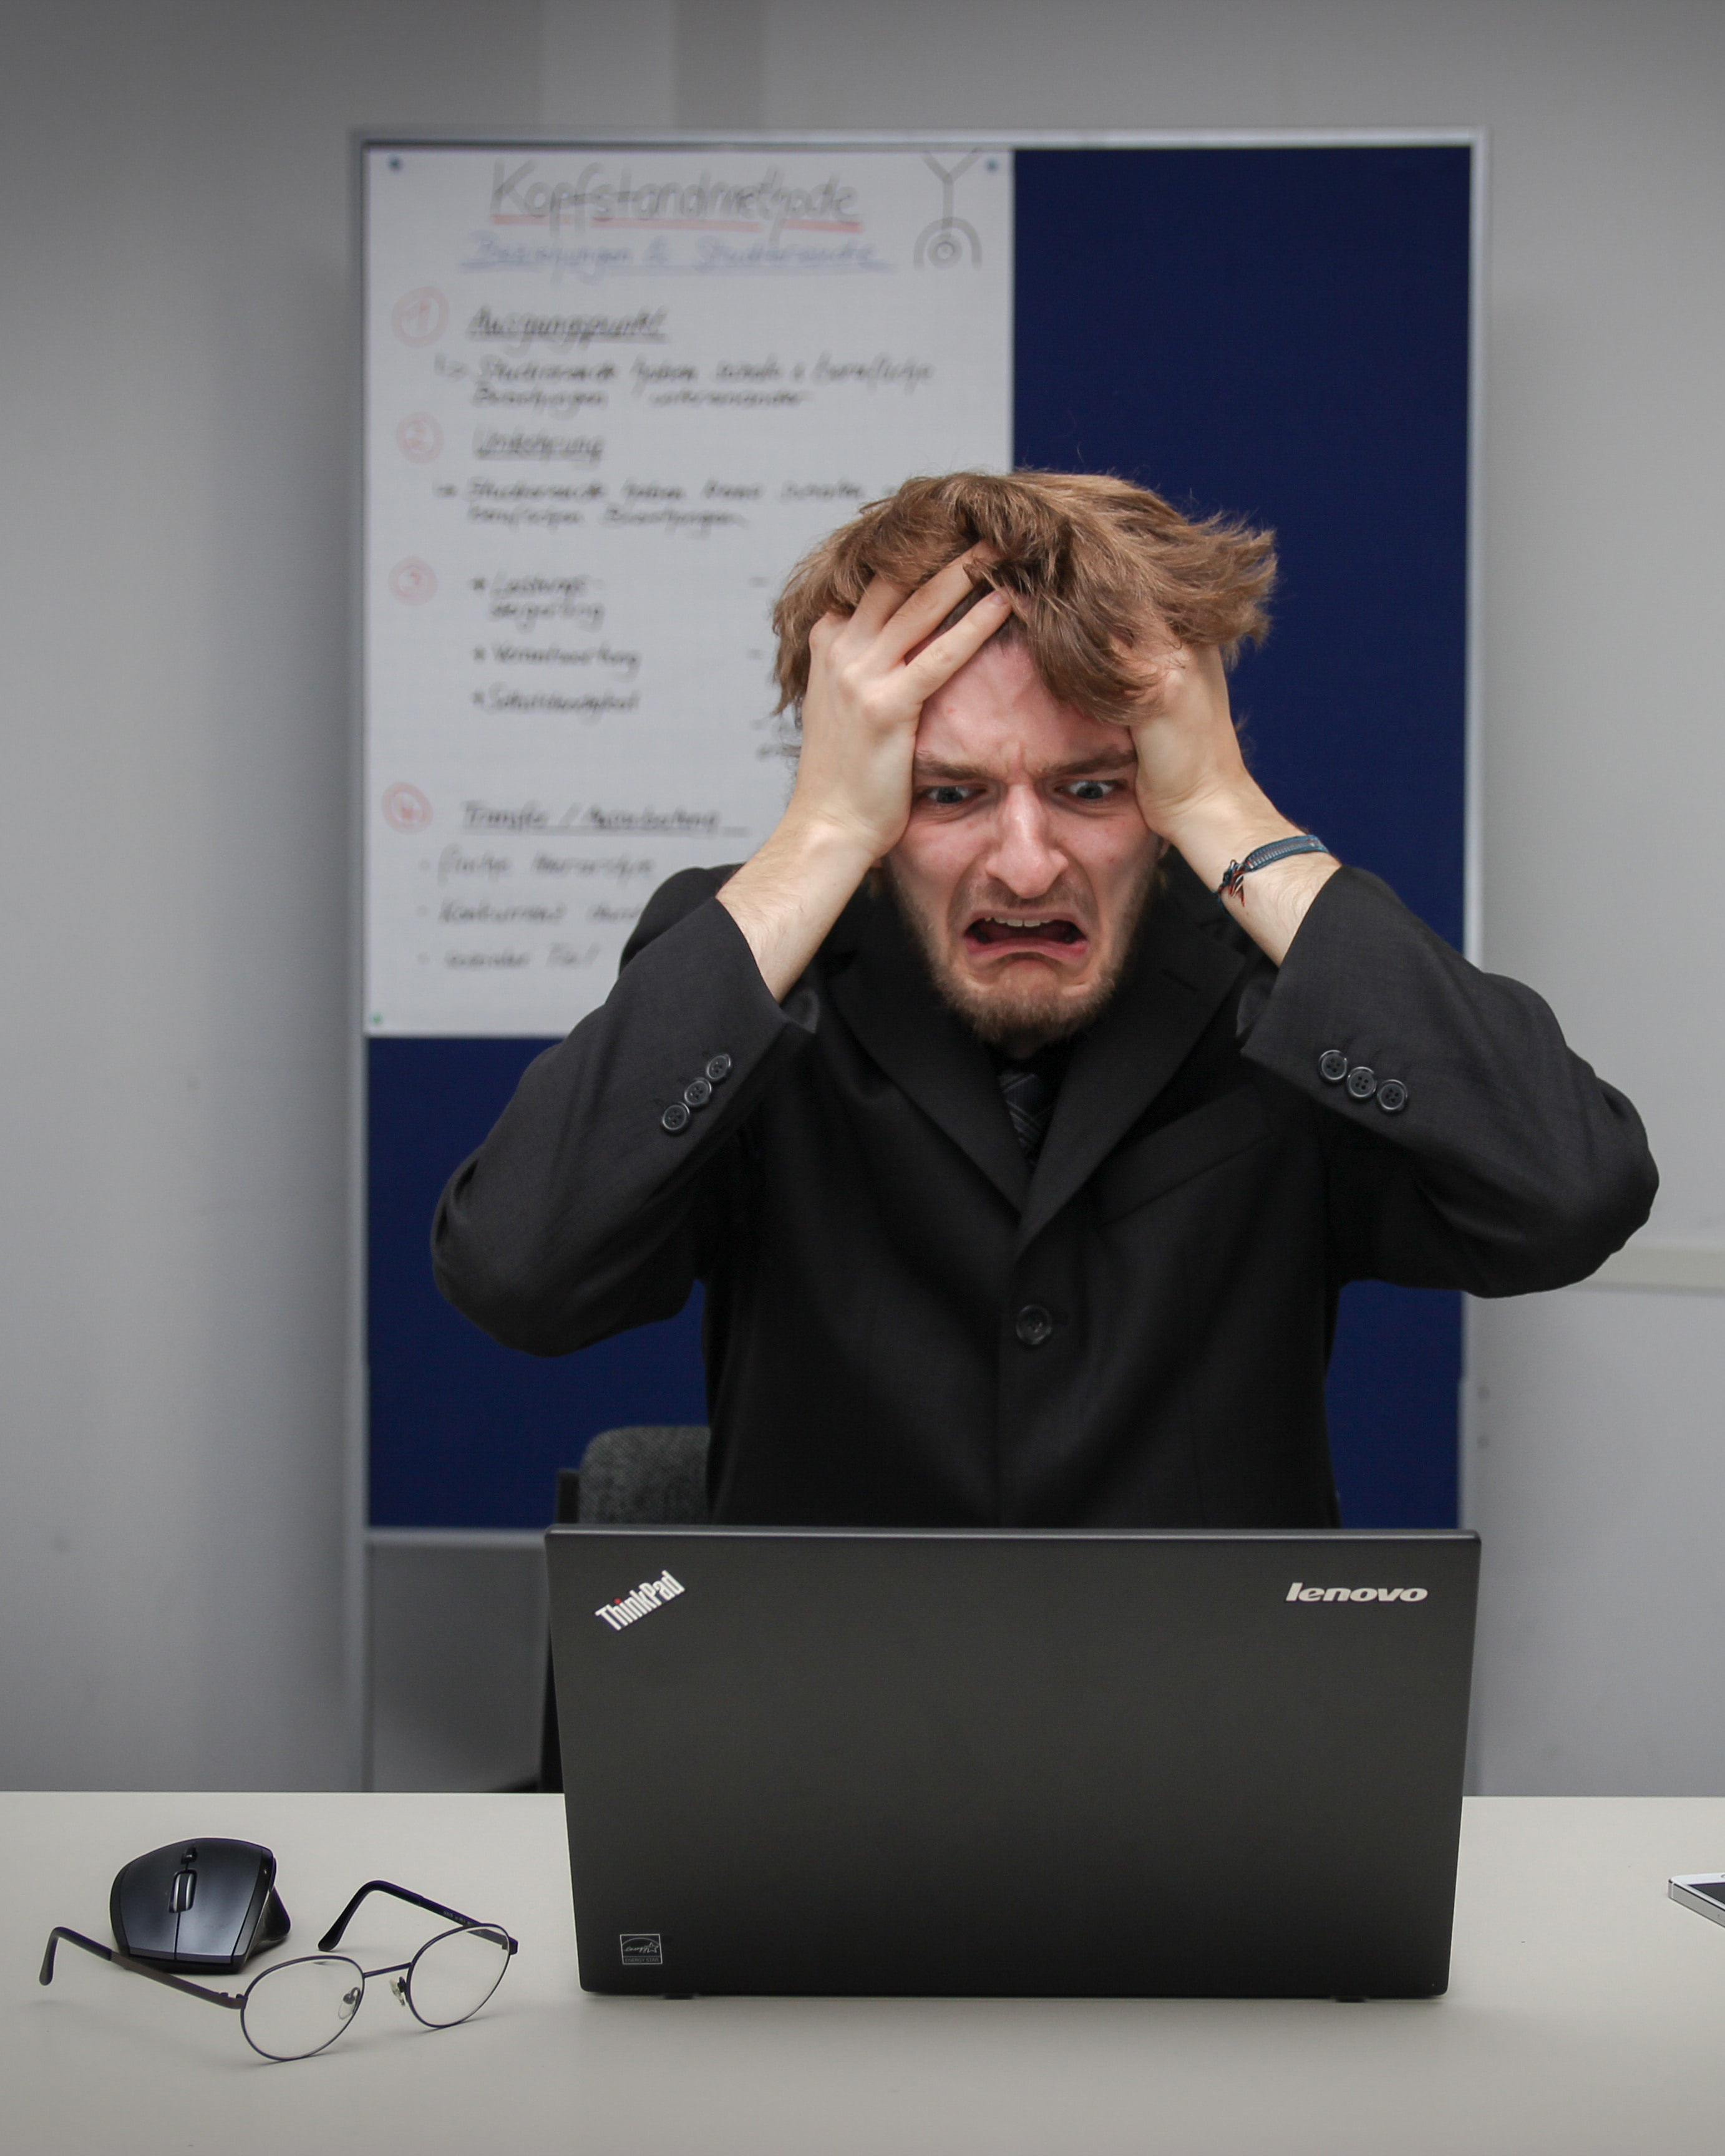 Problemer med innlogging?